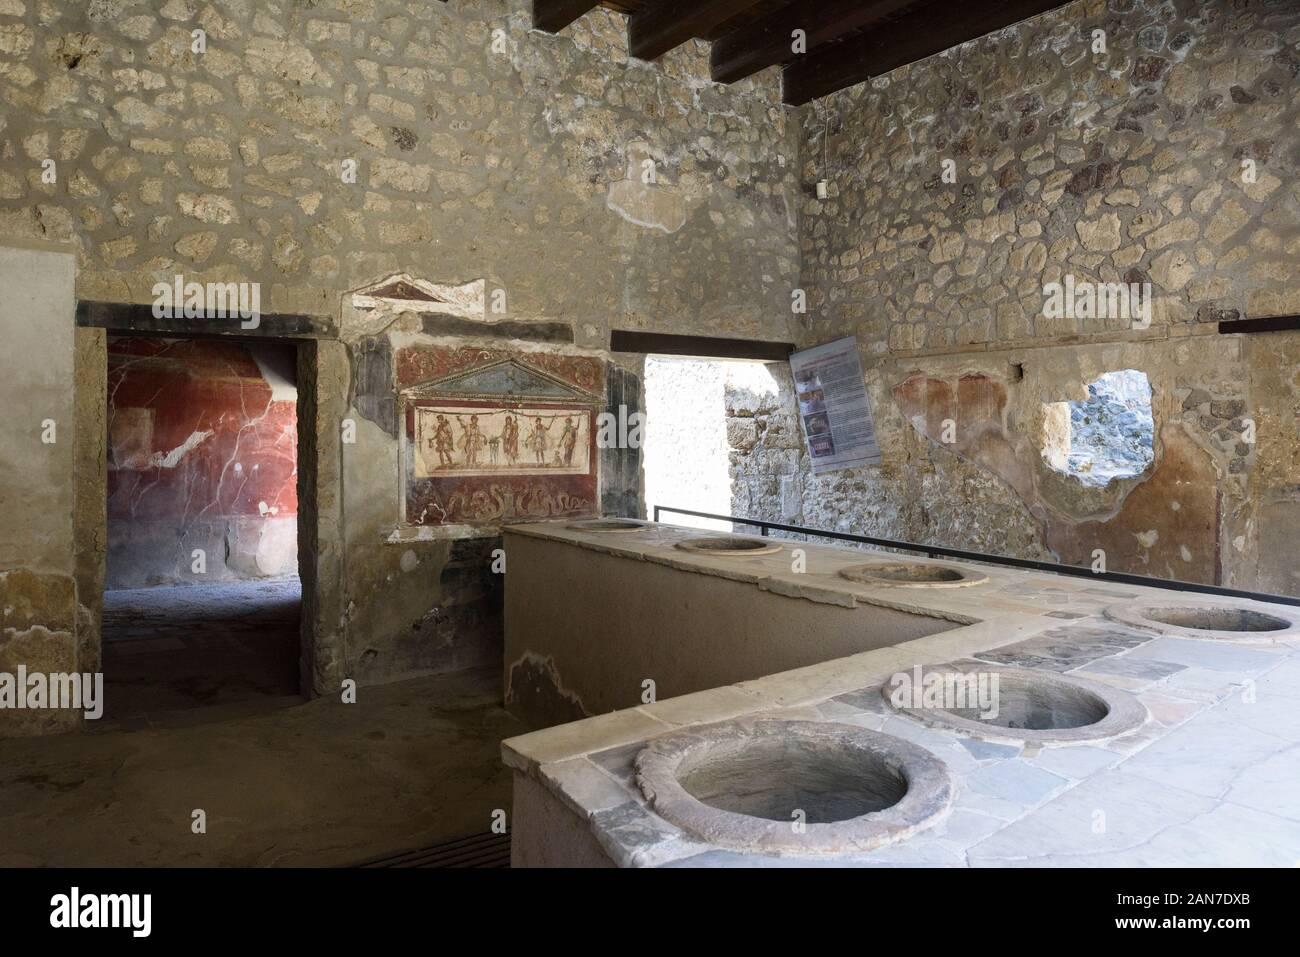 Pompei. Italy. Archaeological site of Pompeii. House and Thermopolium of Vetutius Placidus on via dell'Abbondanza (Casa e Thermopolium di Vetutius Pla Stock Photo